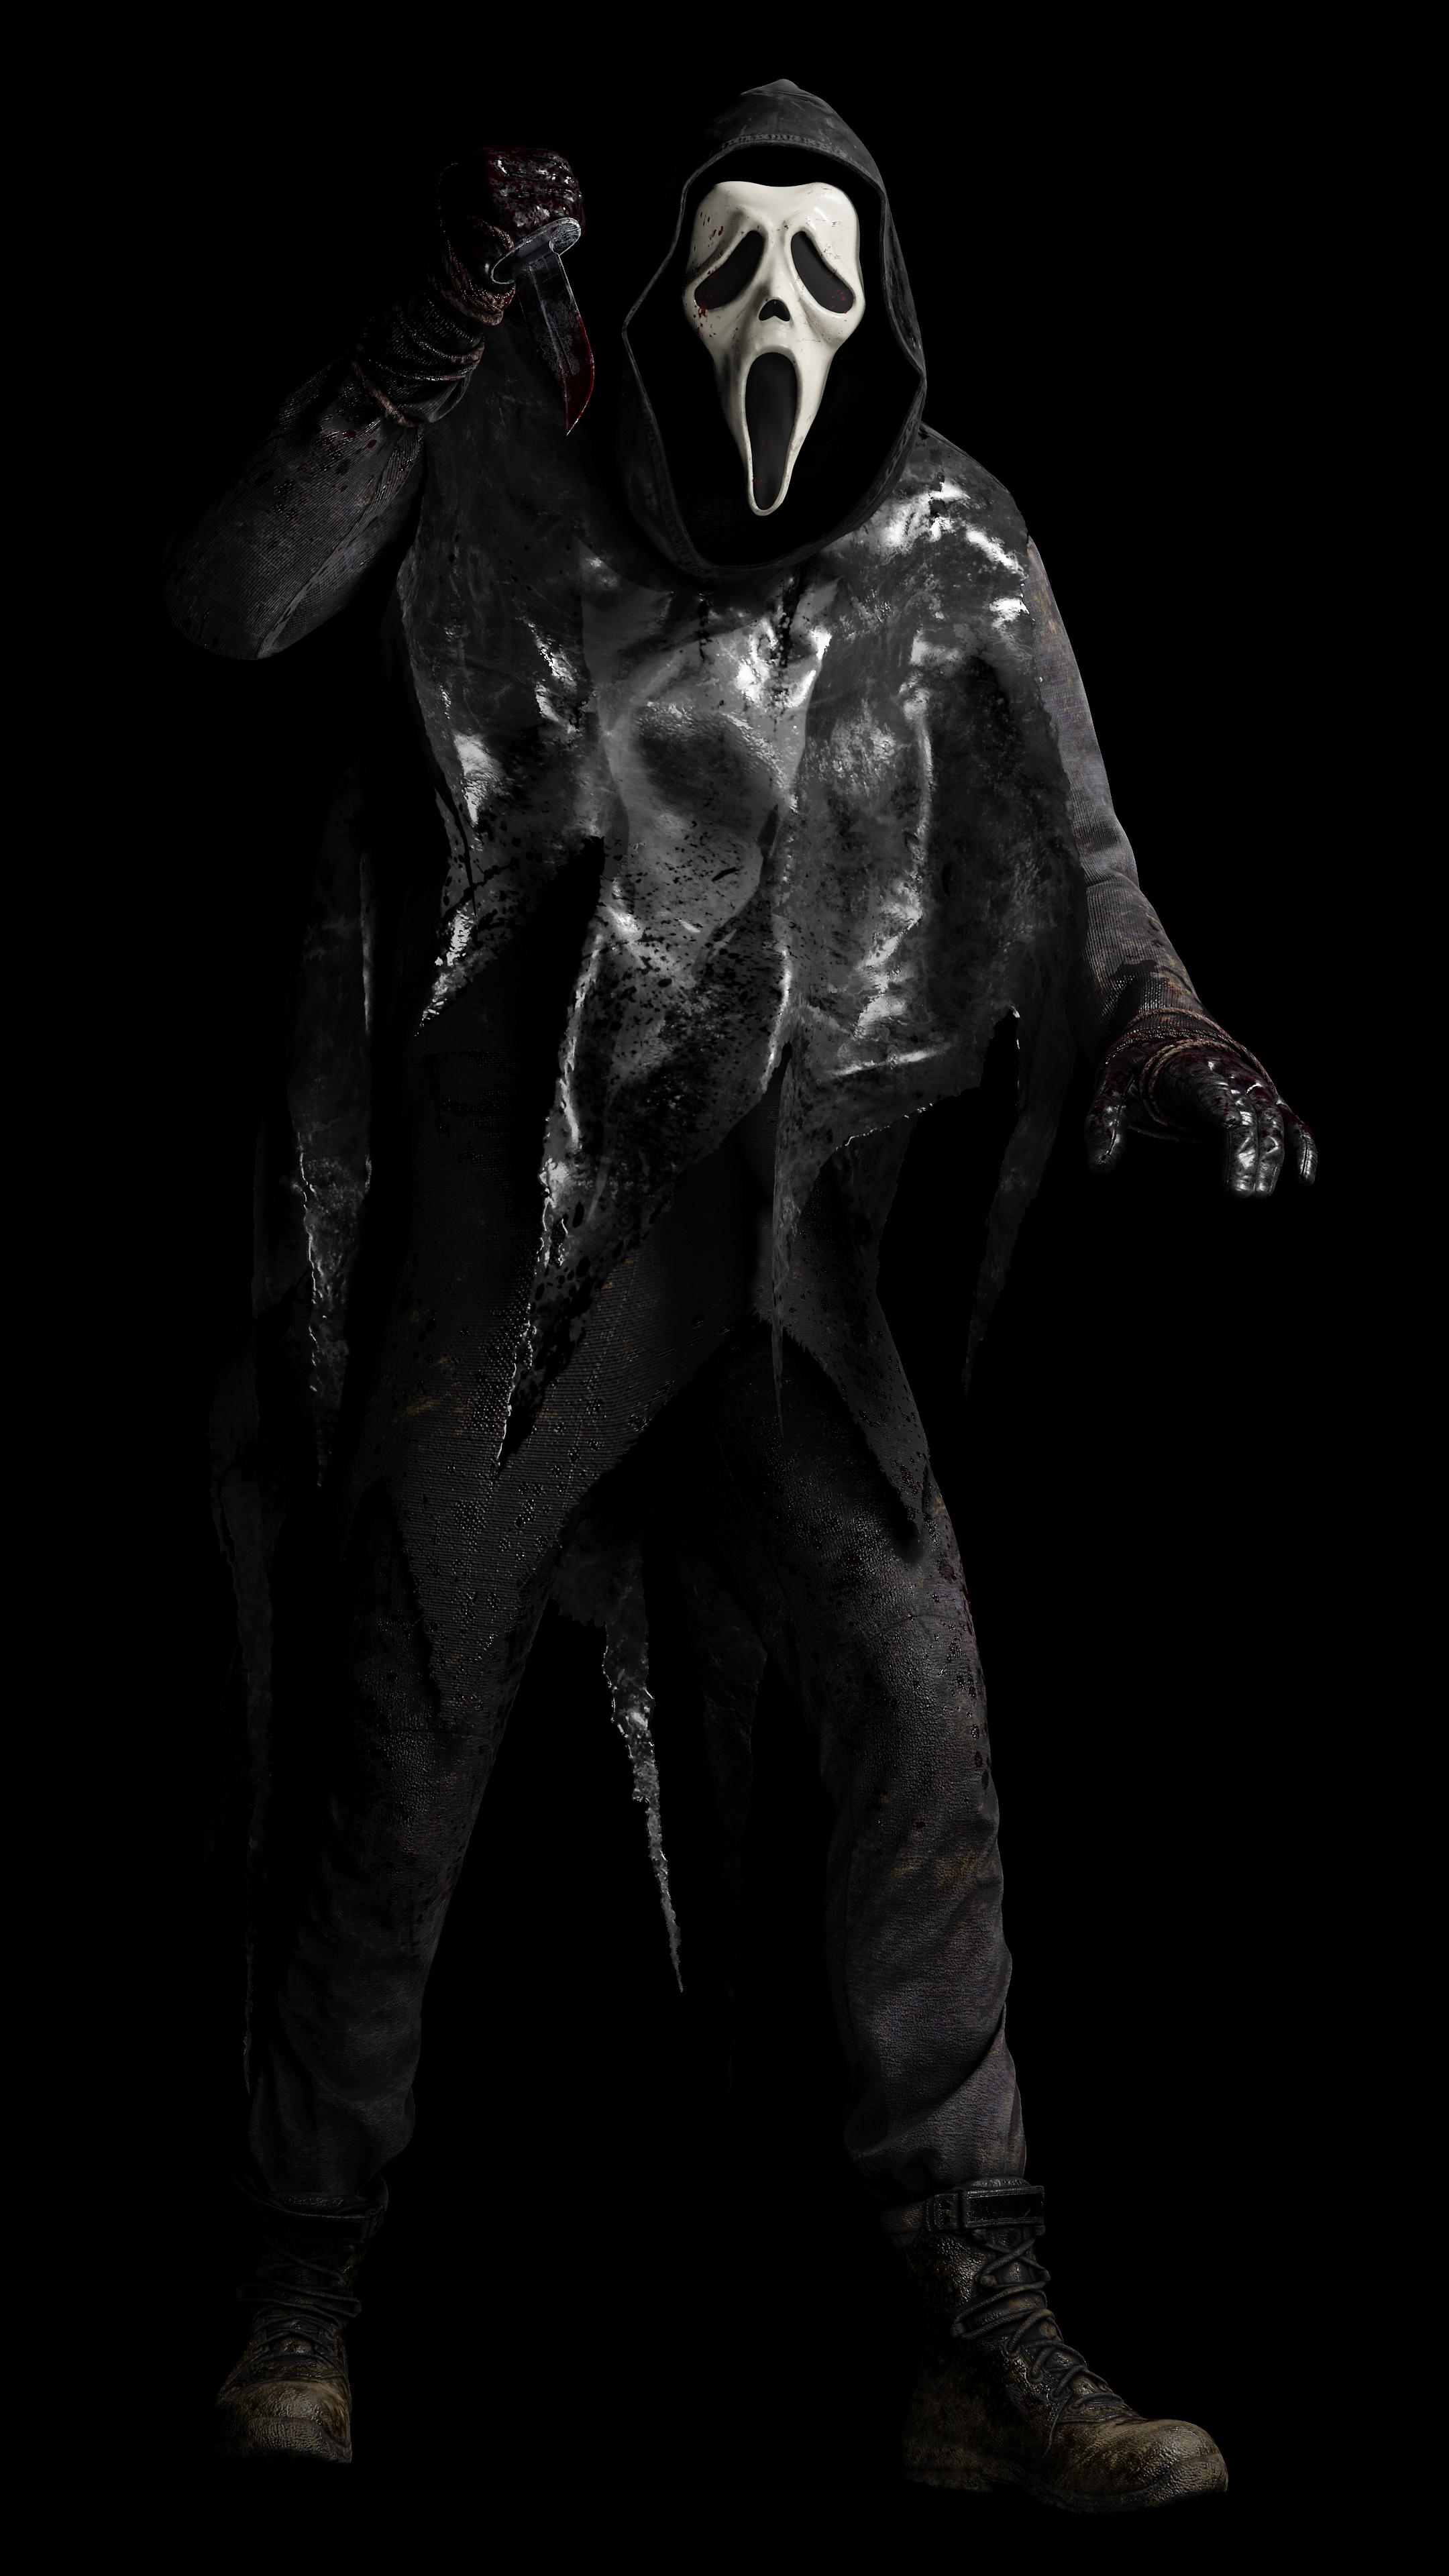 Ghostface By Skemoooo Horror Villains Ghostface Horror Fans